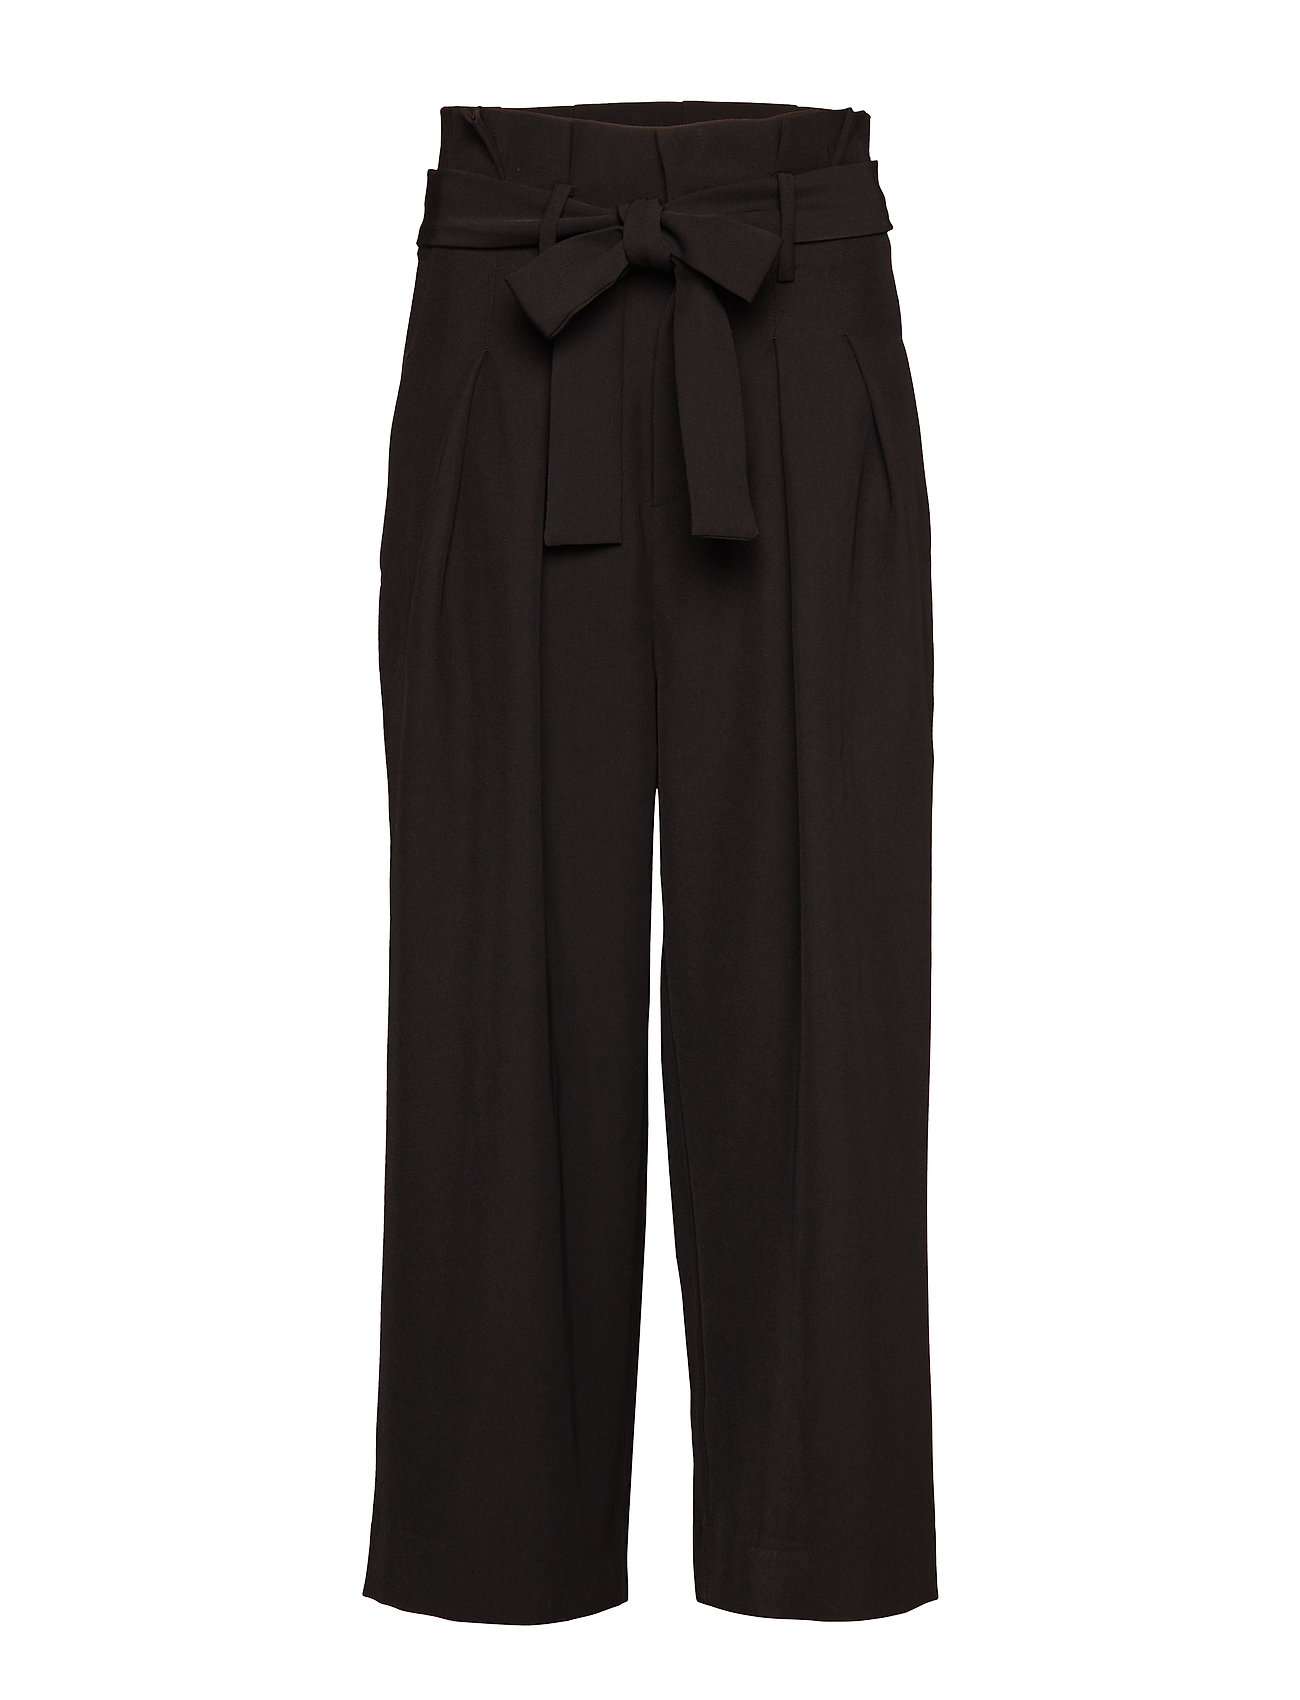 InWear CaraIW Culotte Pant - BLACK